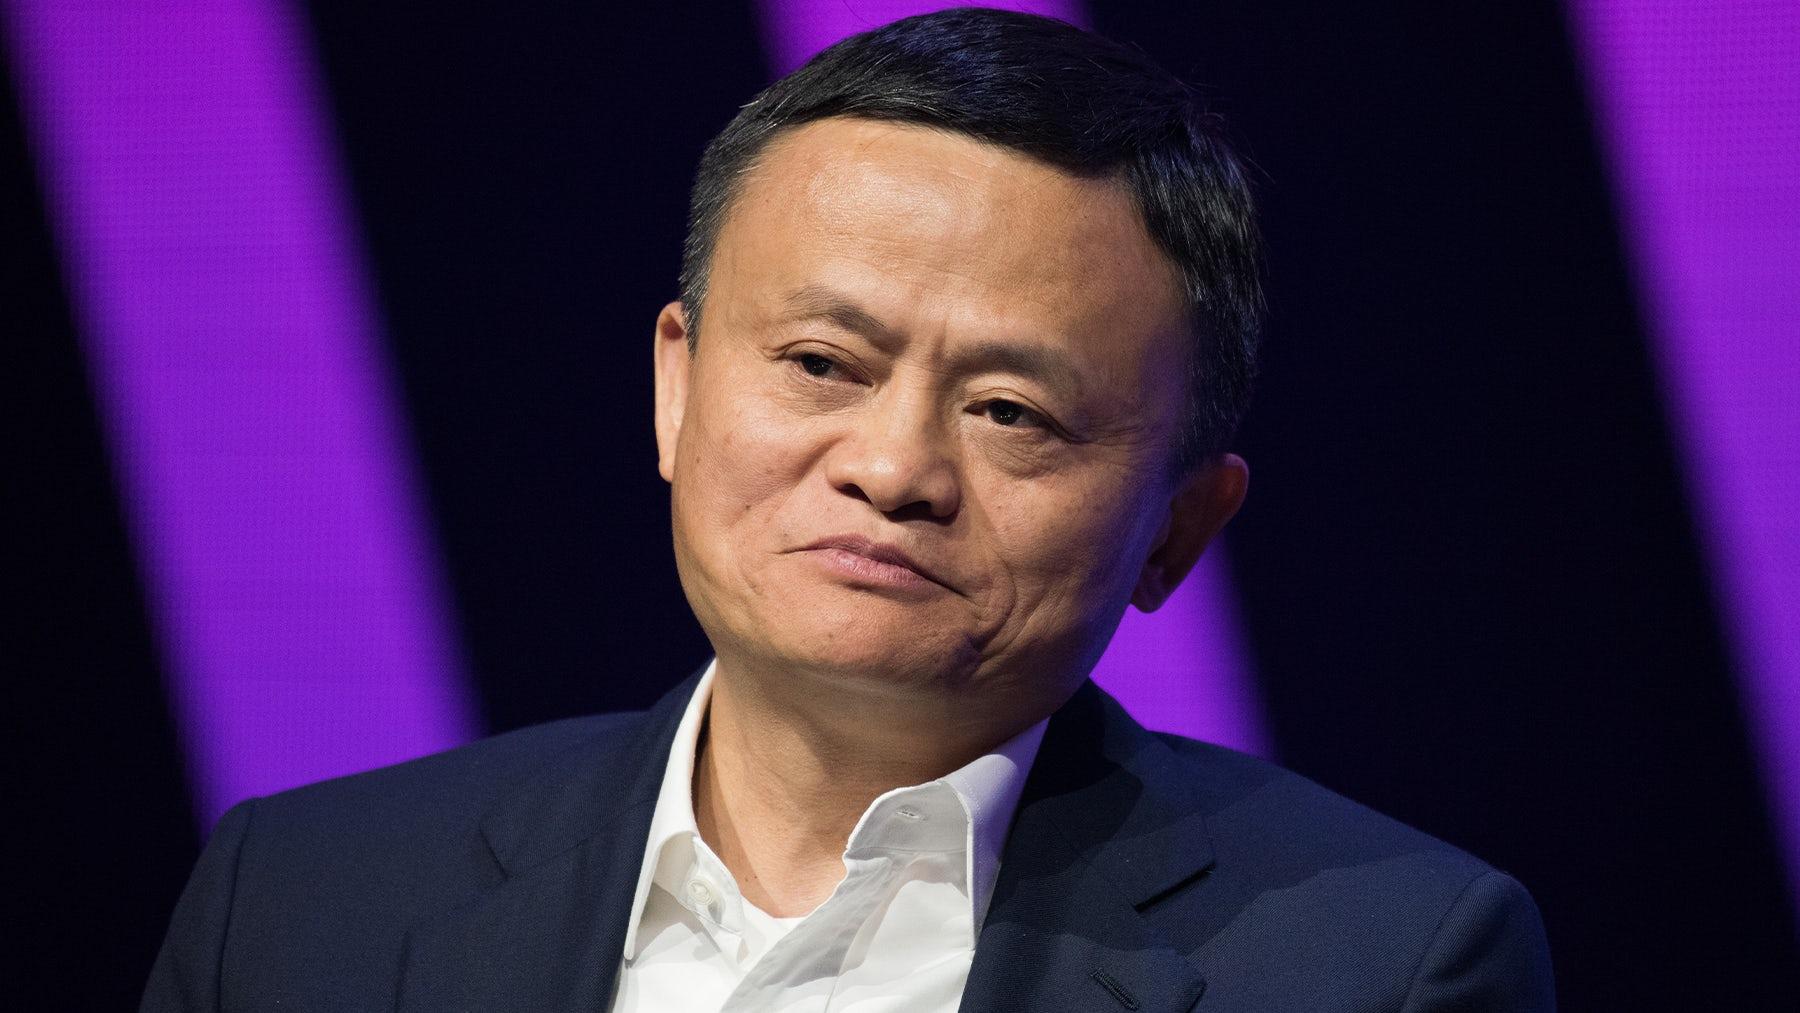 Jack Ma\'s company Alibaba was summoned by regulators. Shutterstock.